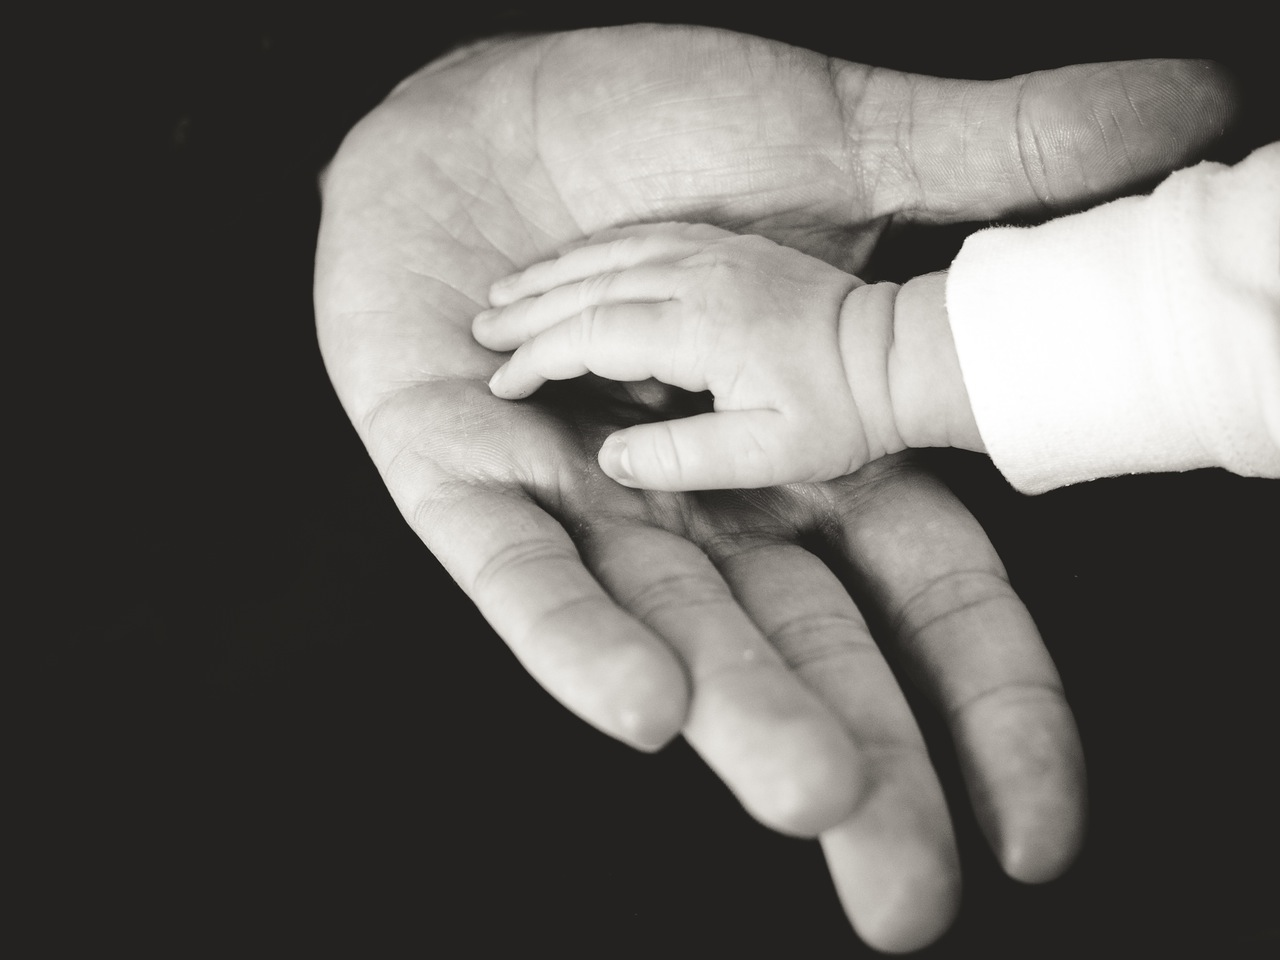 5 Top Priorities When Baby Is On Its Way